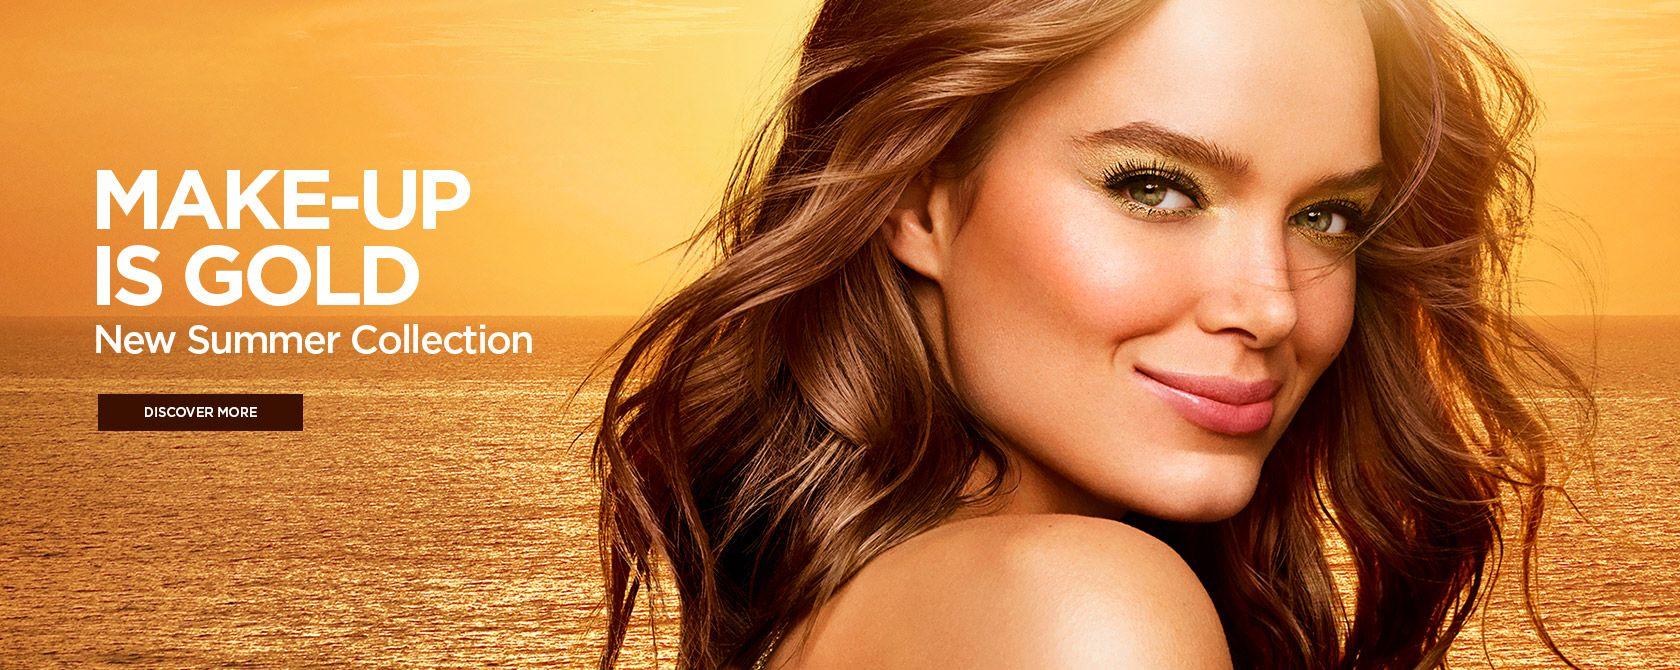 Kiko milano professional makeup and cutting edge skin care treatments baditri Images